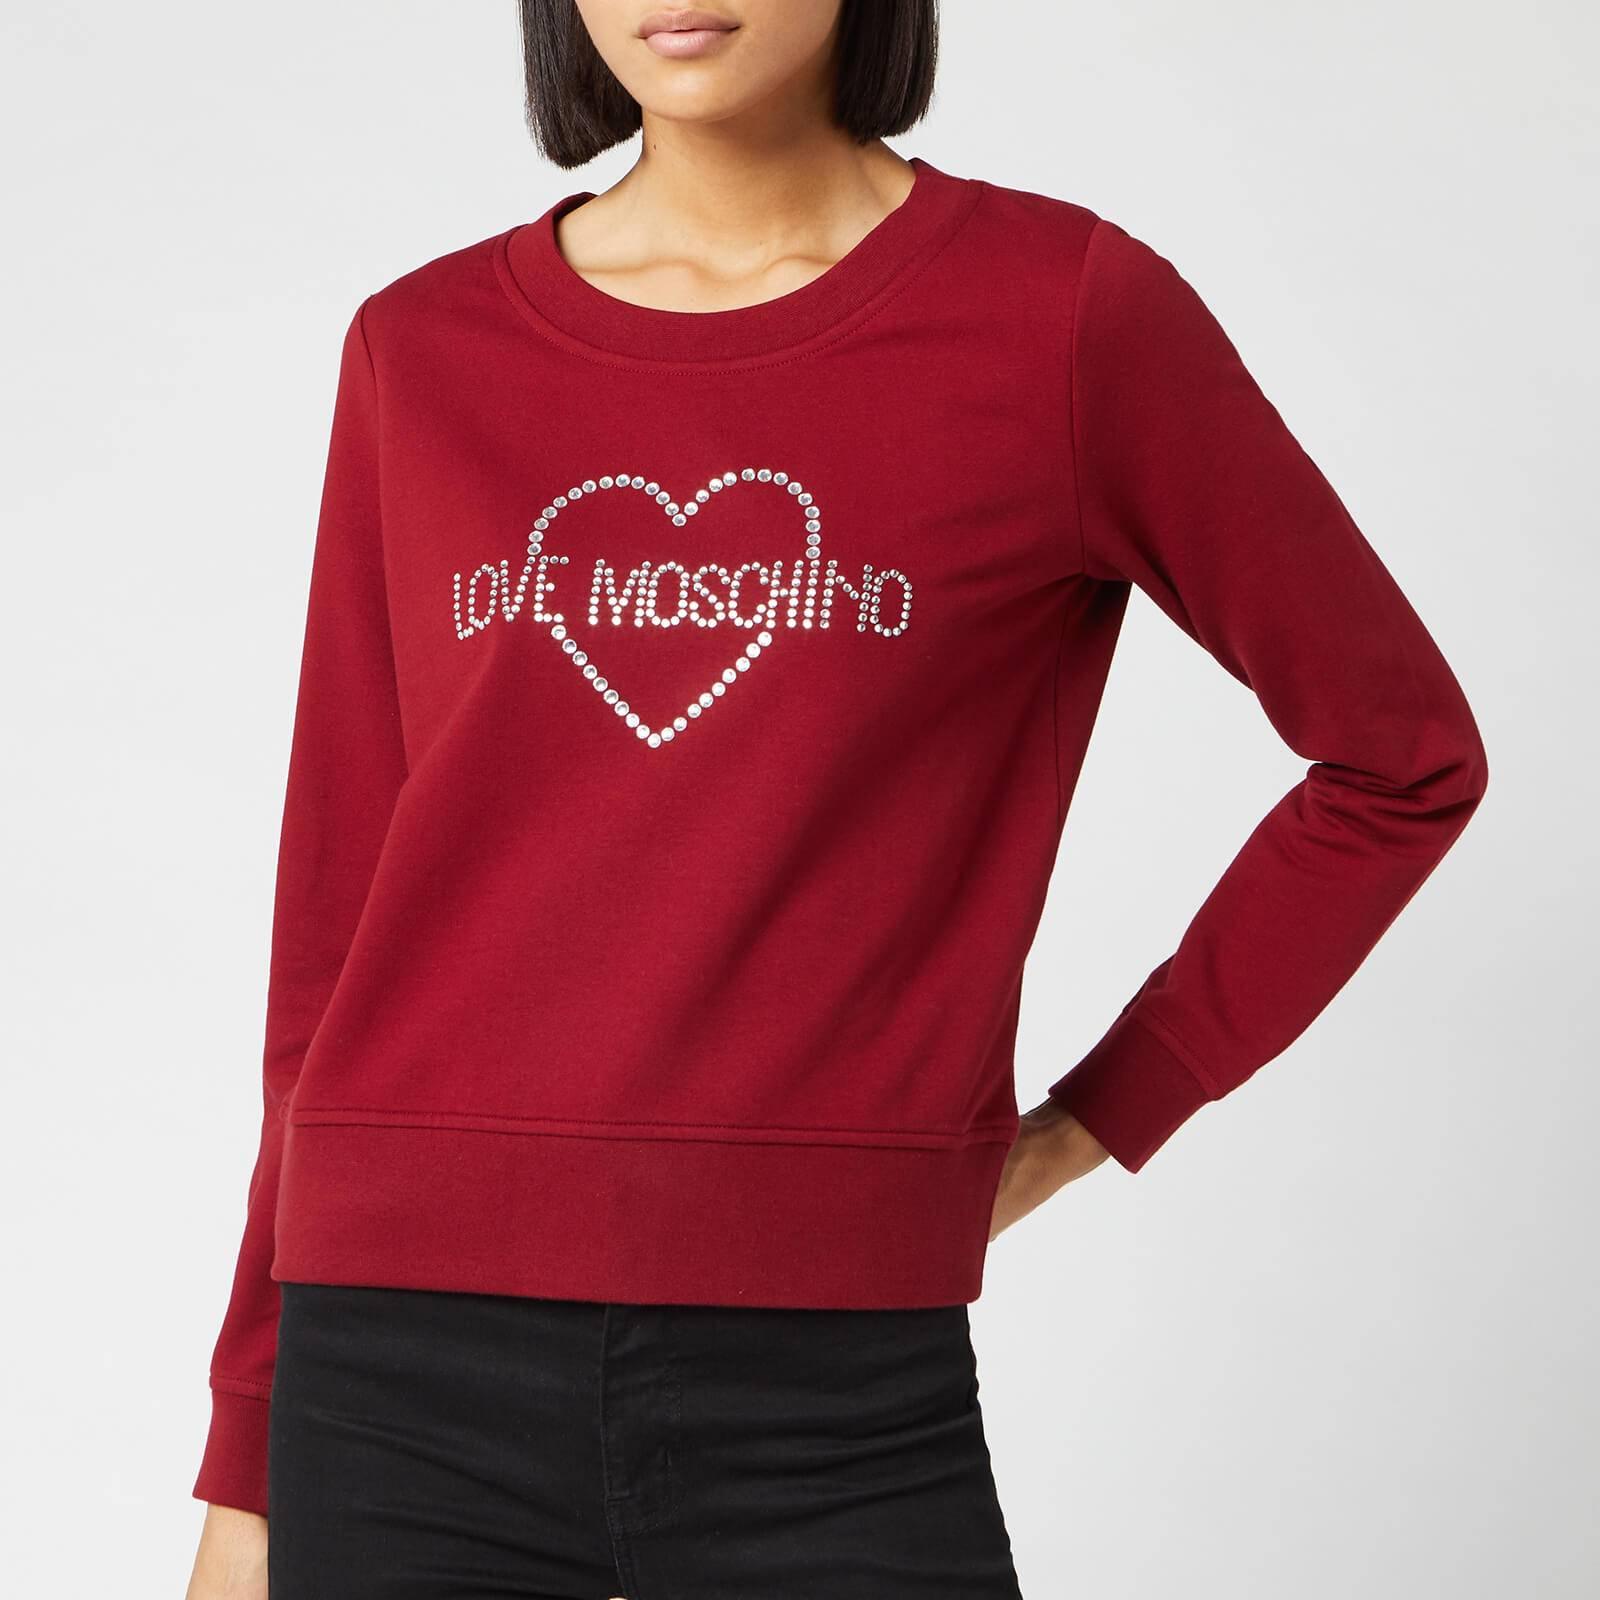 Moschino Love Moschino Women's Crystal Logo Sweater - Red - IT 40/UK 8 - Red